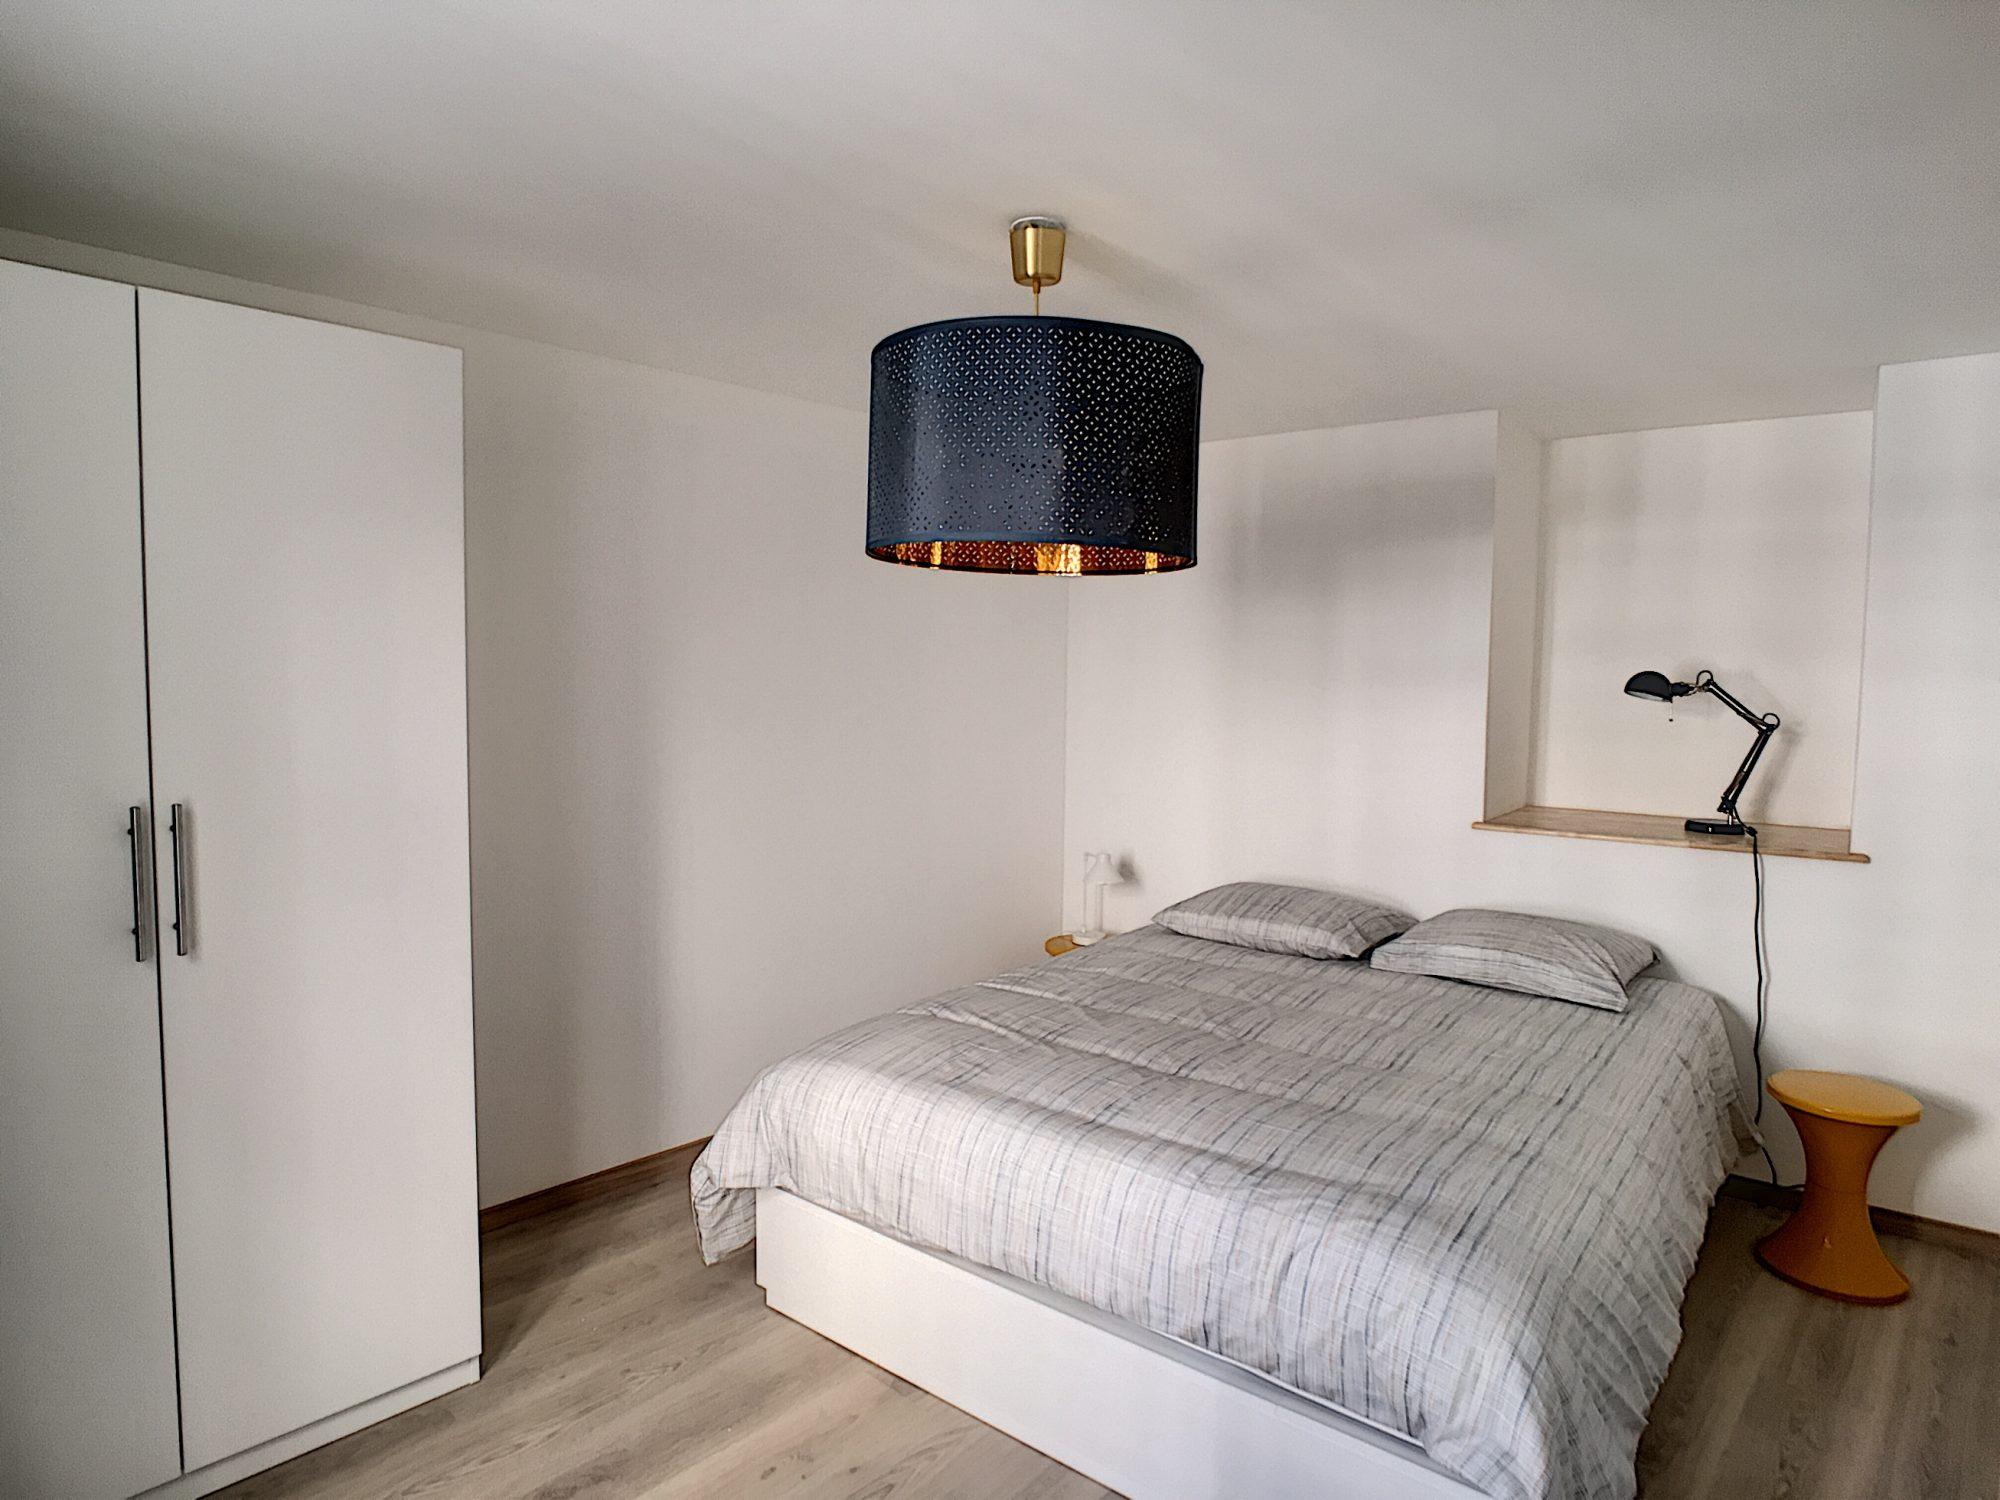 [Atypique] Splendide 2 pièces meublé avec terrasse – Petite France / quai Turckheim - nos locations - Beausite Immobilier 7